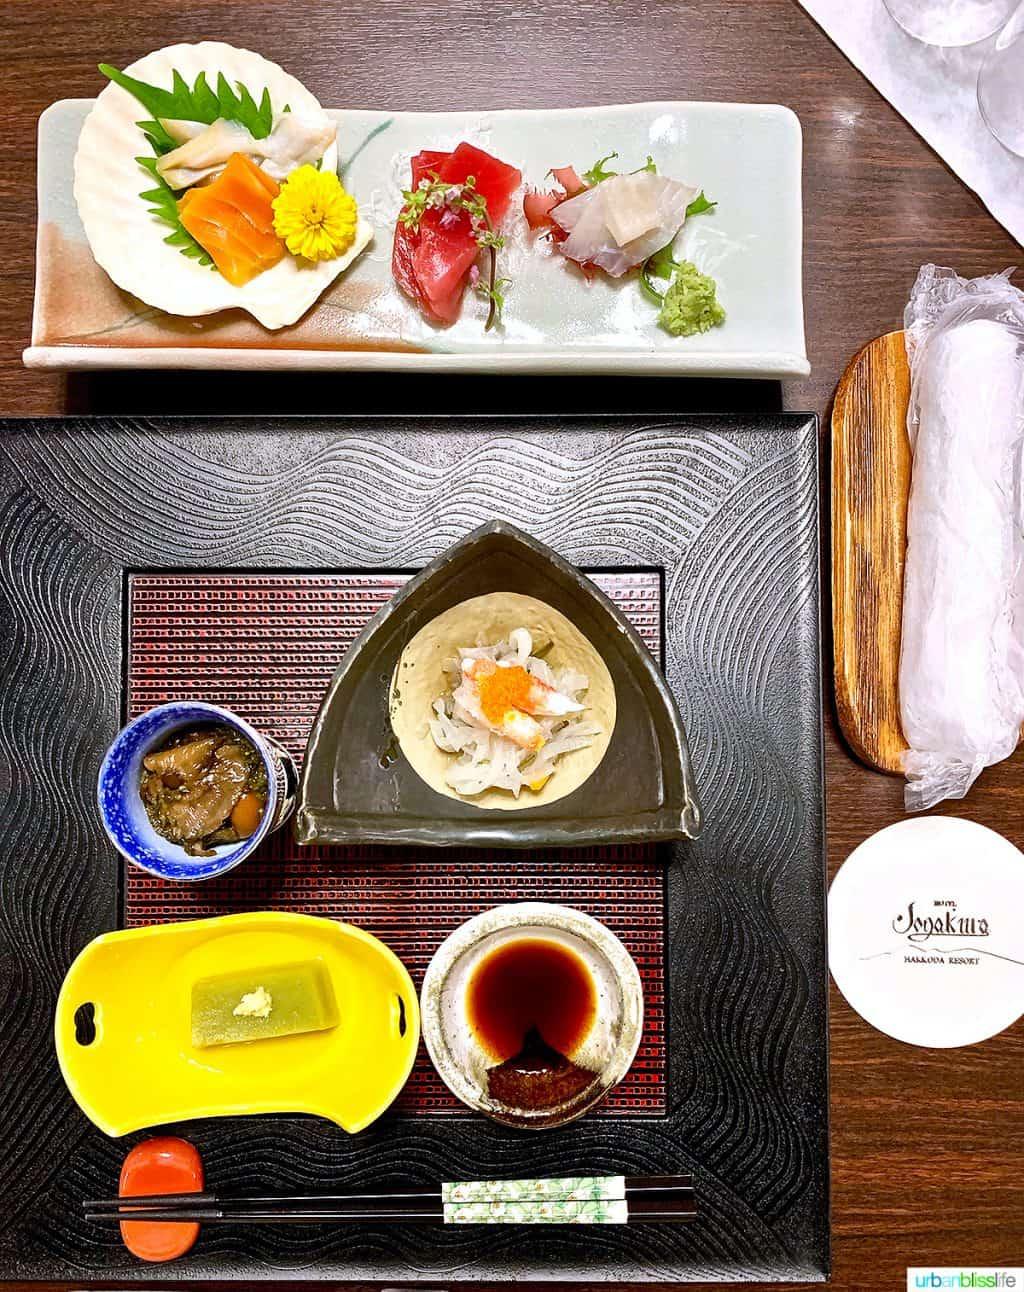 traditional Japanese dinner at Hotel Jogakura